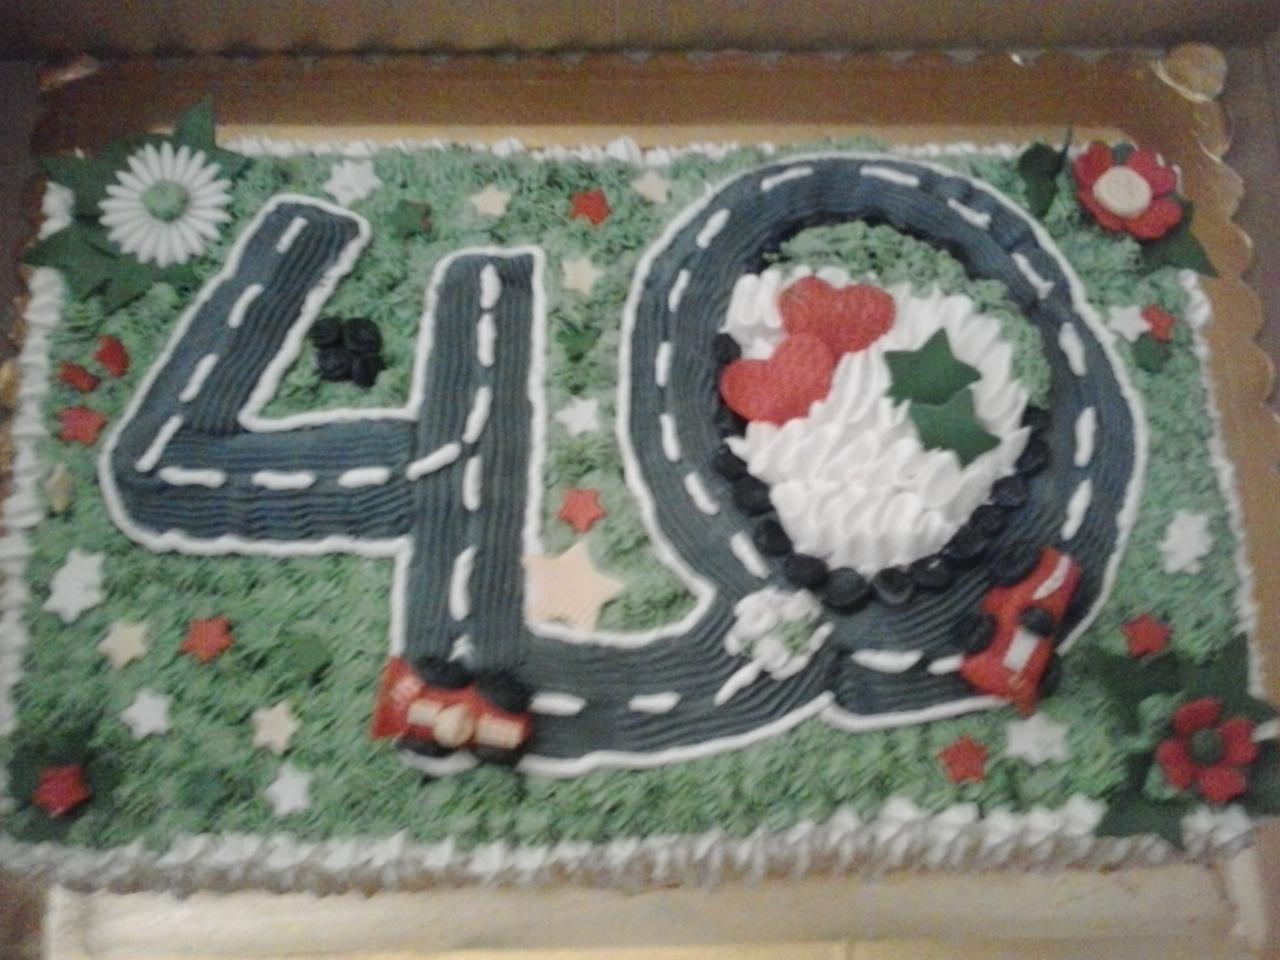 Super tarta 40 cumpleaños con Thermomix® . bizcocho genoves, crema pastelera de chocolate